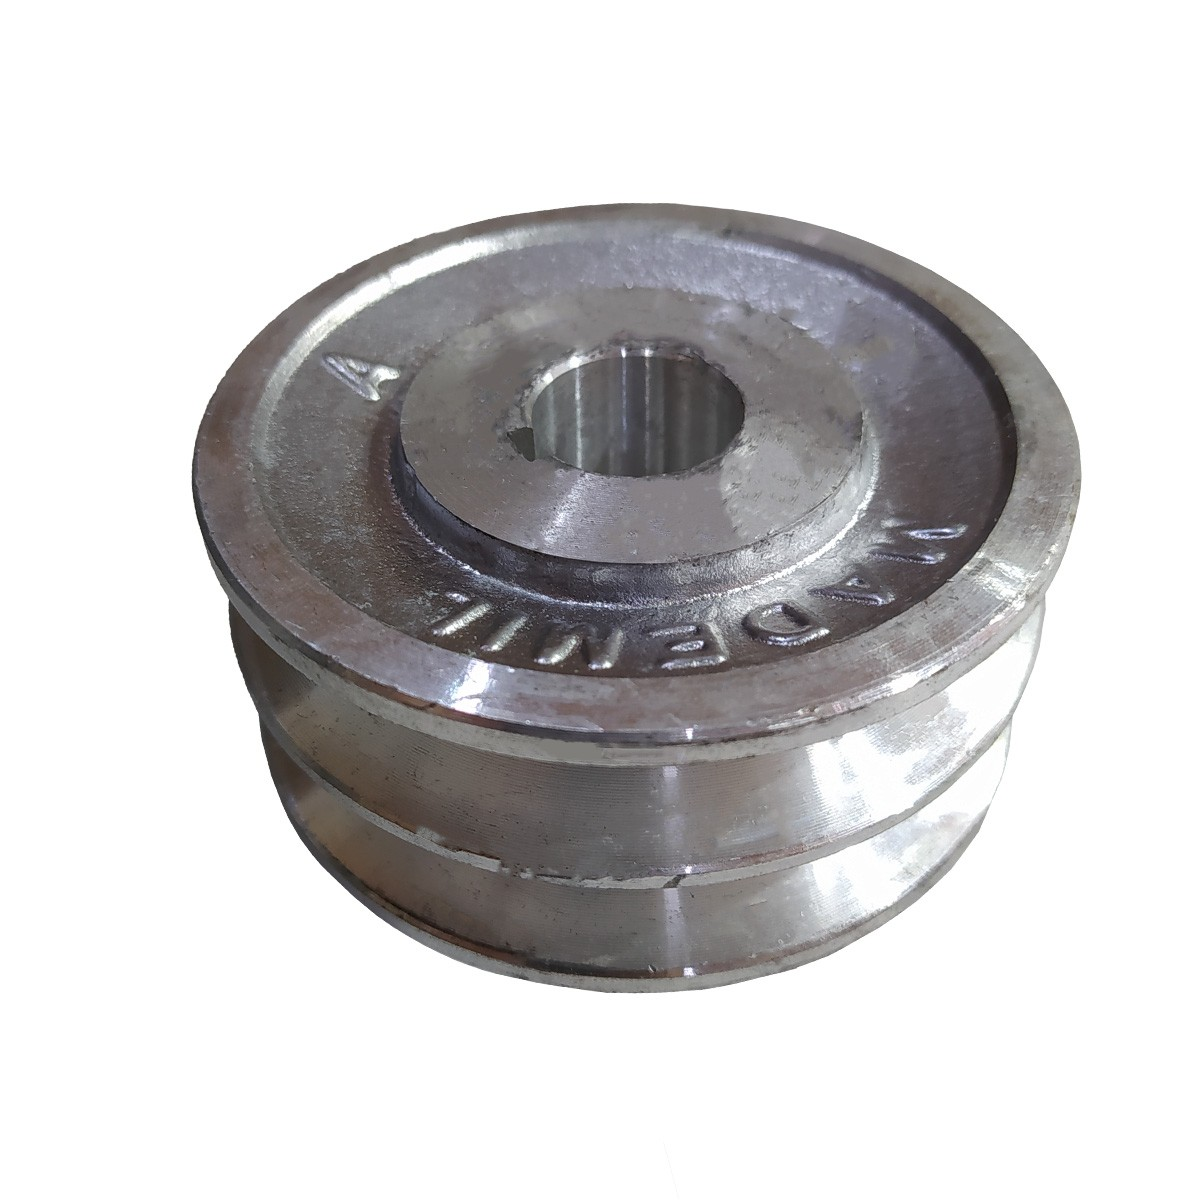 "Polia De Aluminio 90mm Motor Furo 3/4"" 19mm 2 Canal A Chaveta"